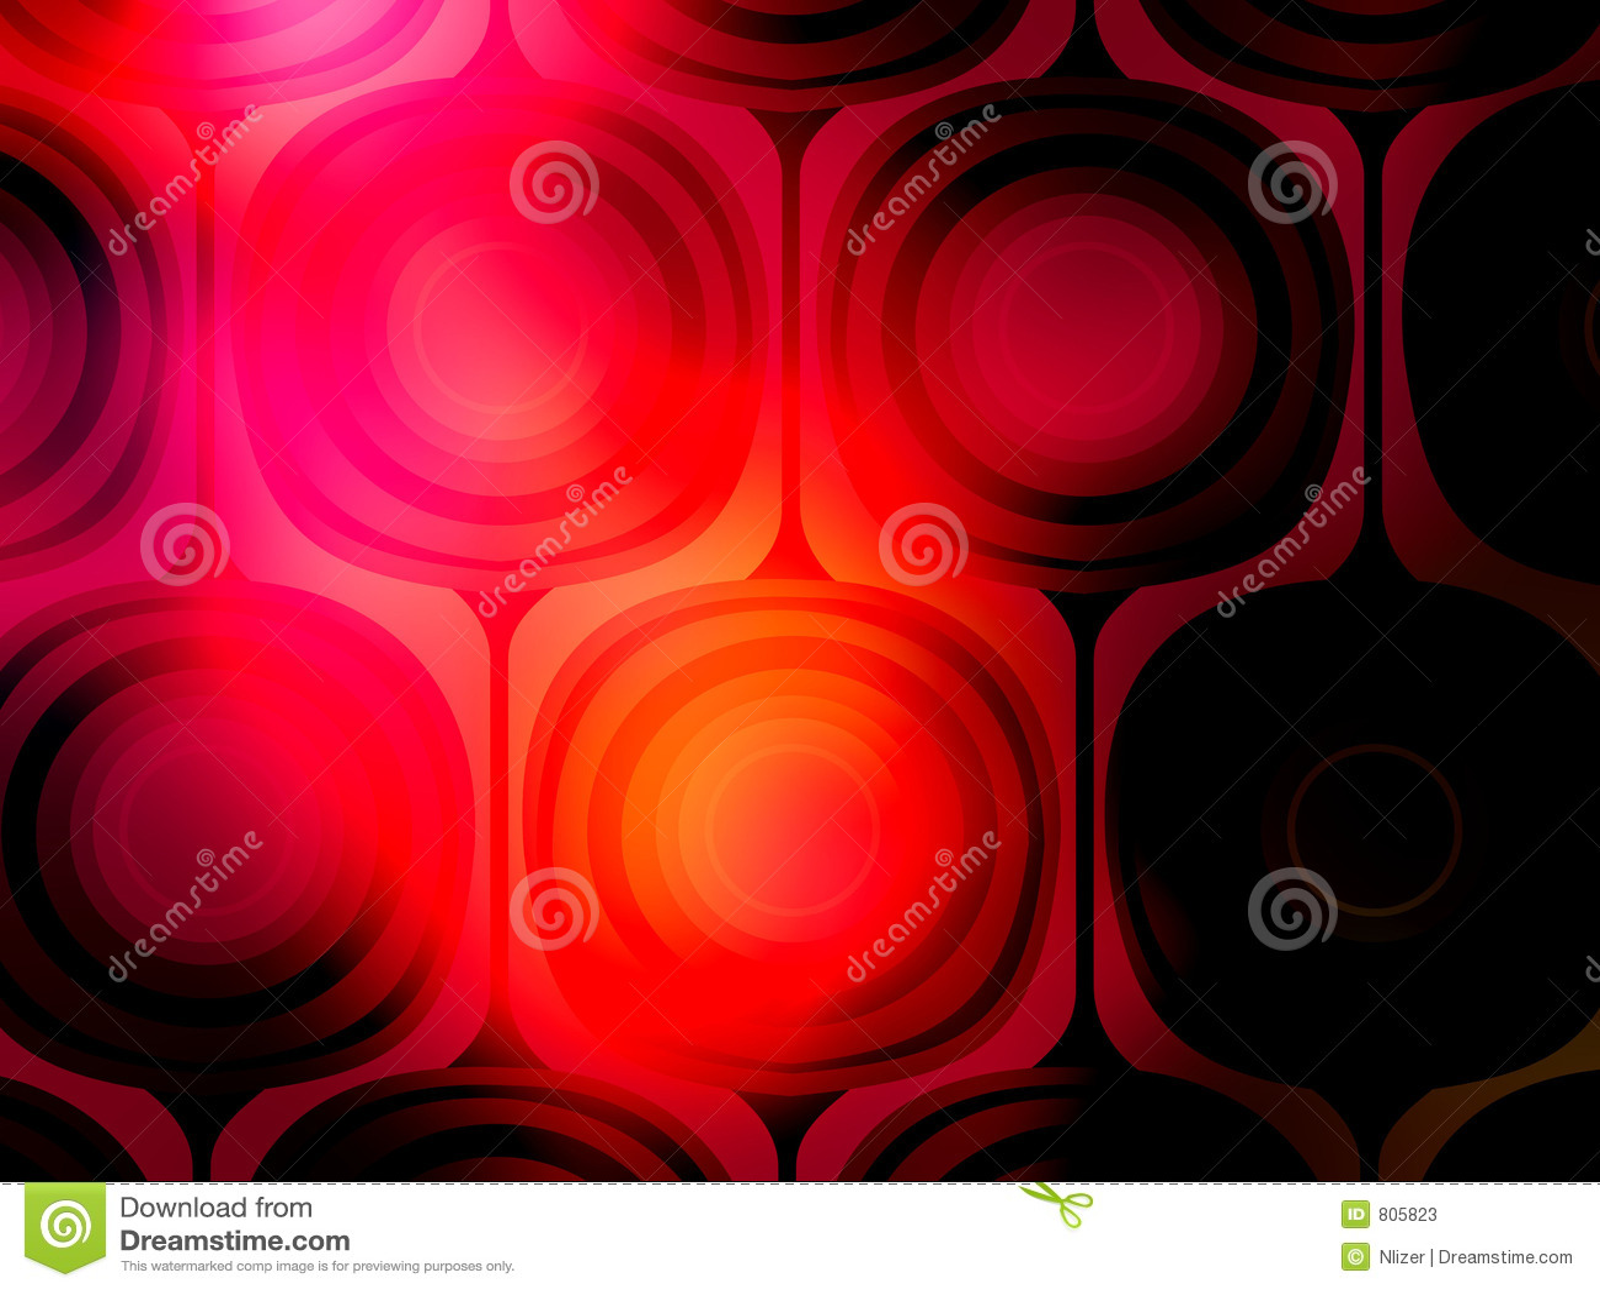 Vibrant Red Black Mod Background Wallpaper Stock